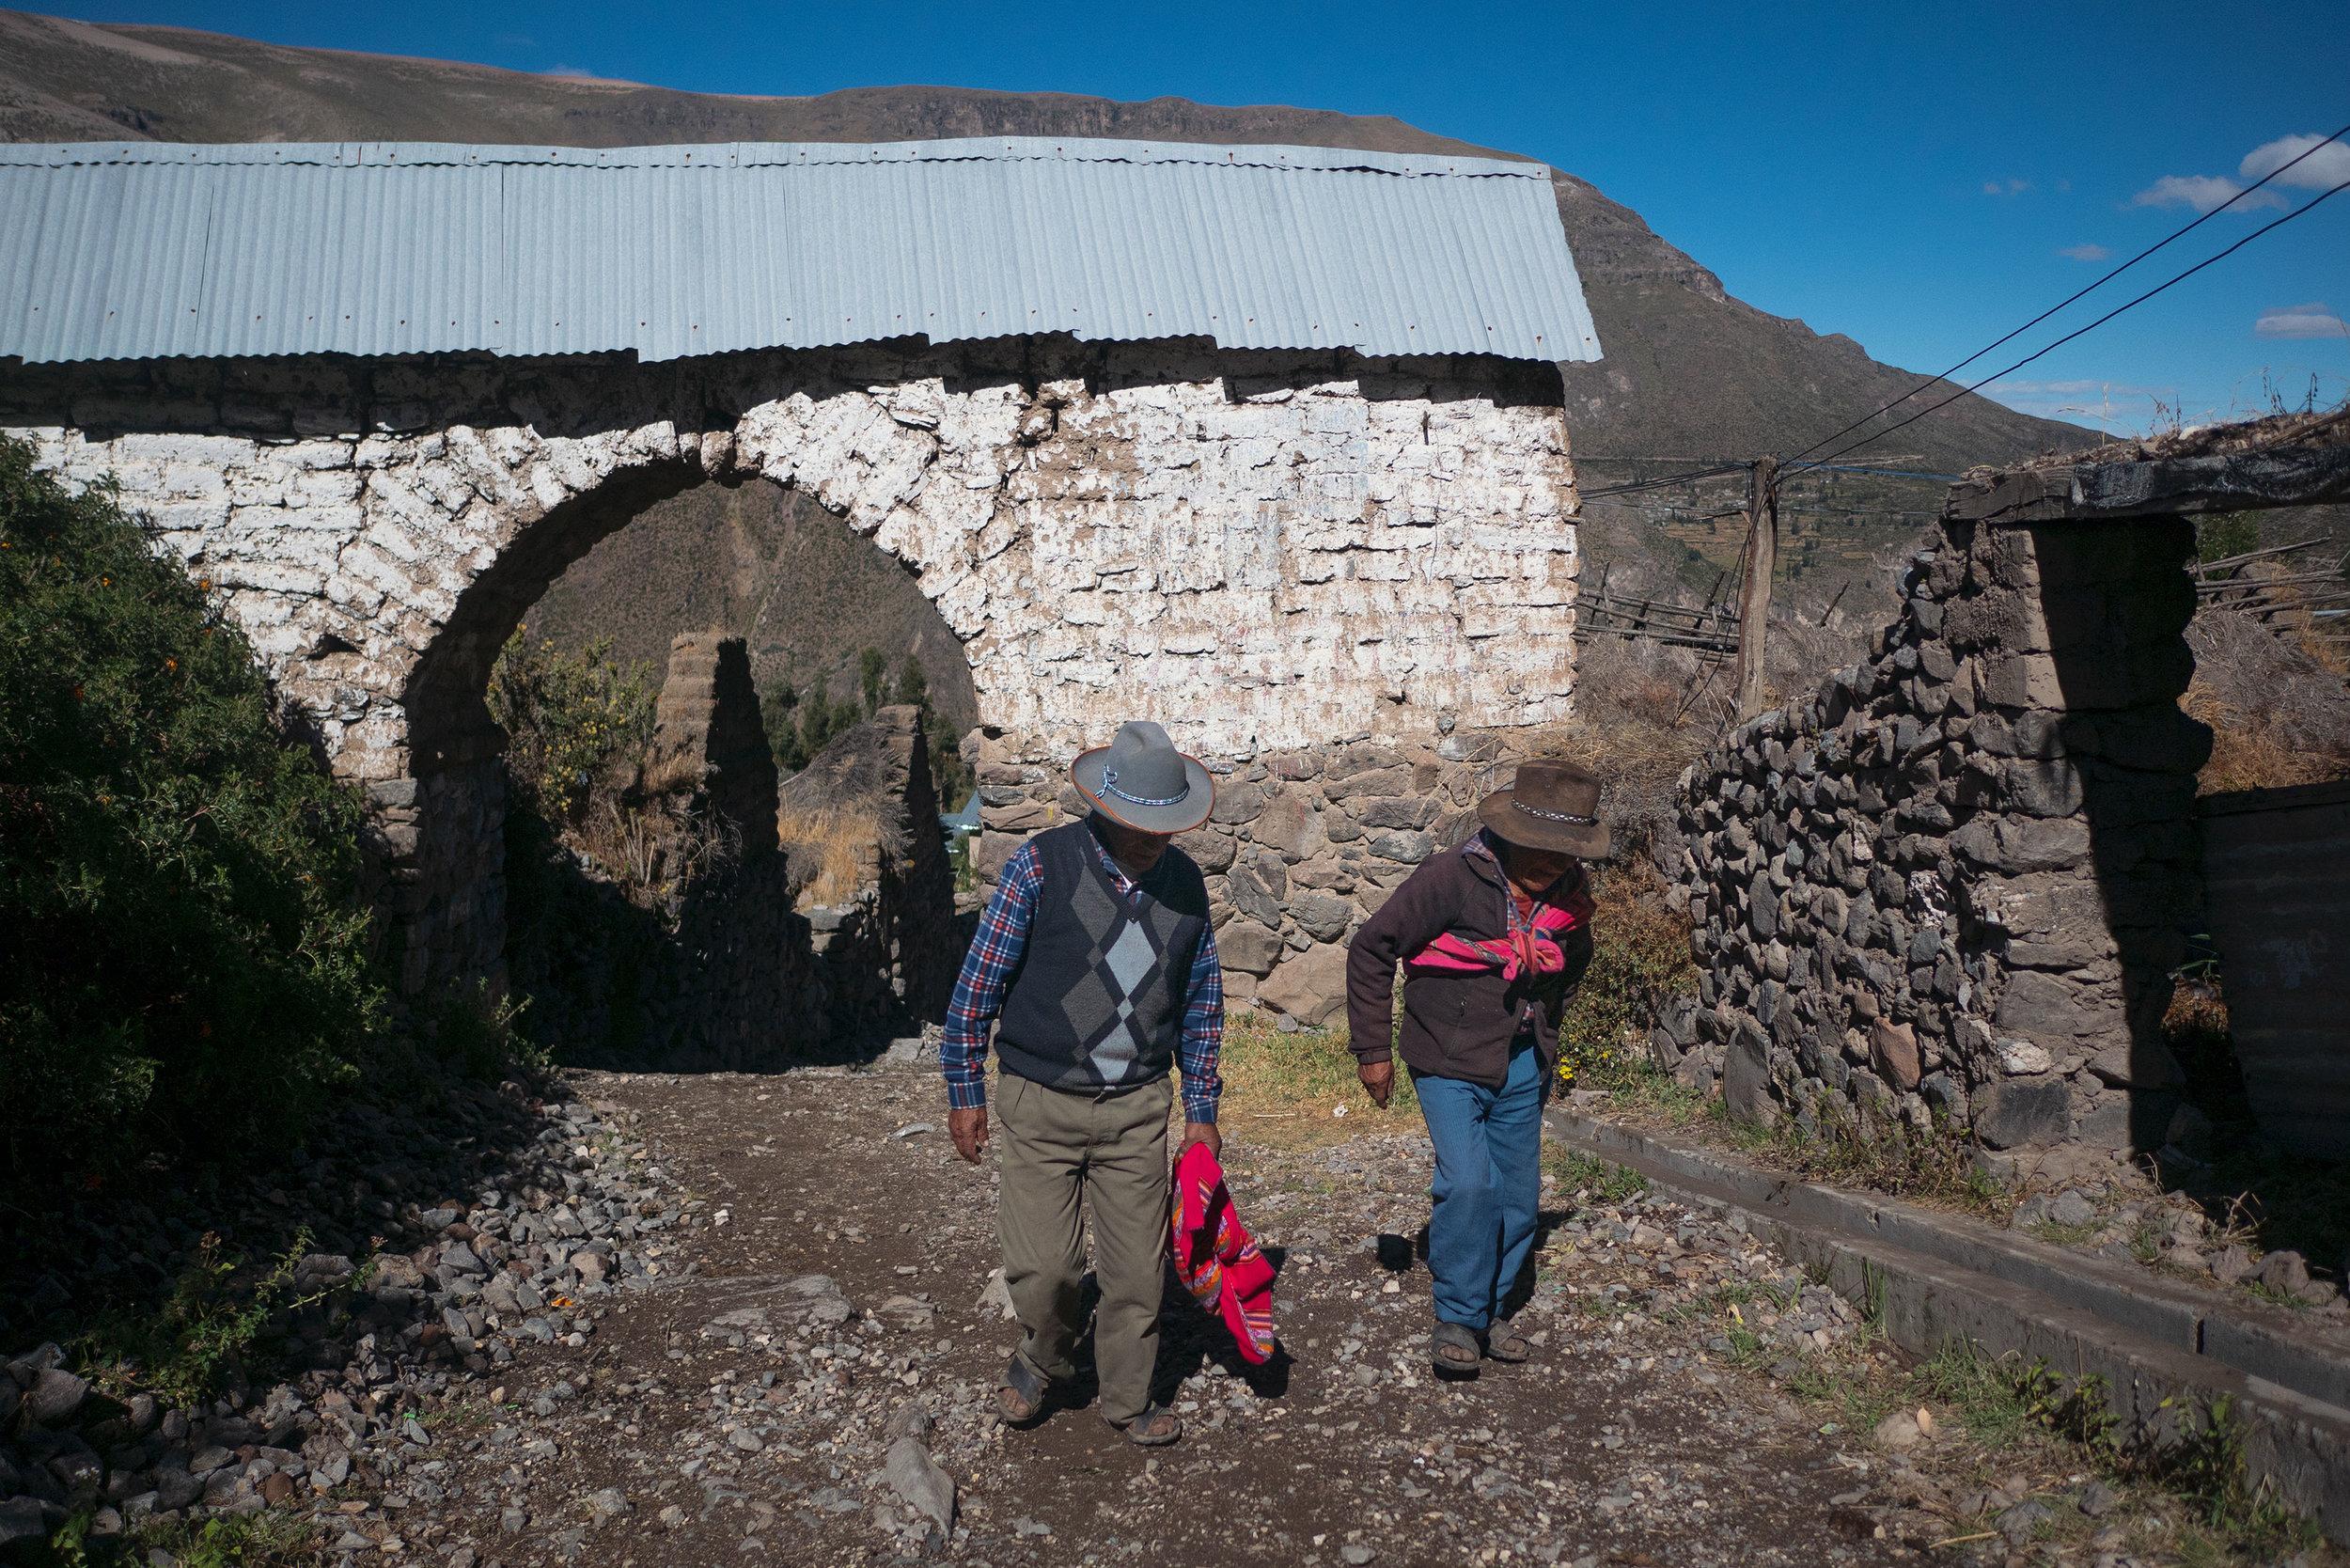 Men against an ancient arch in Puica, Peru